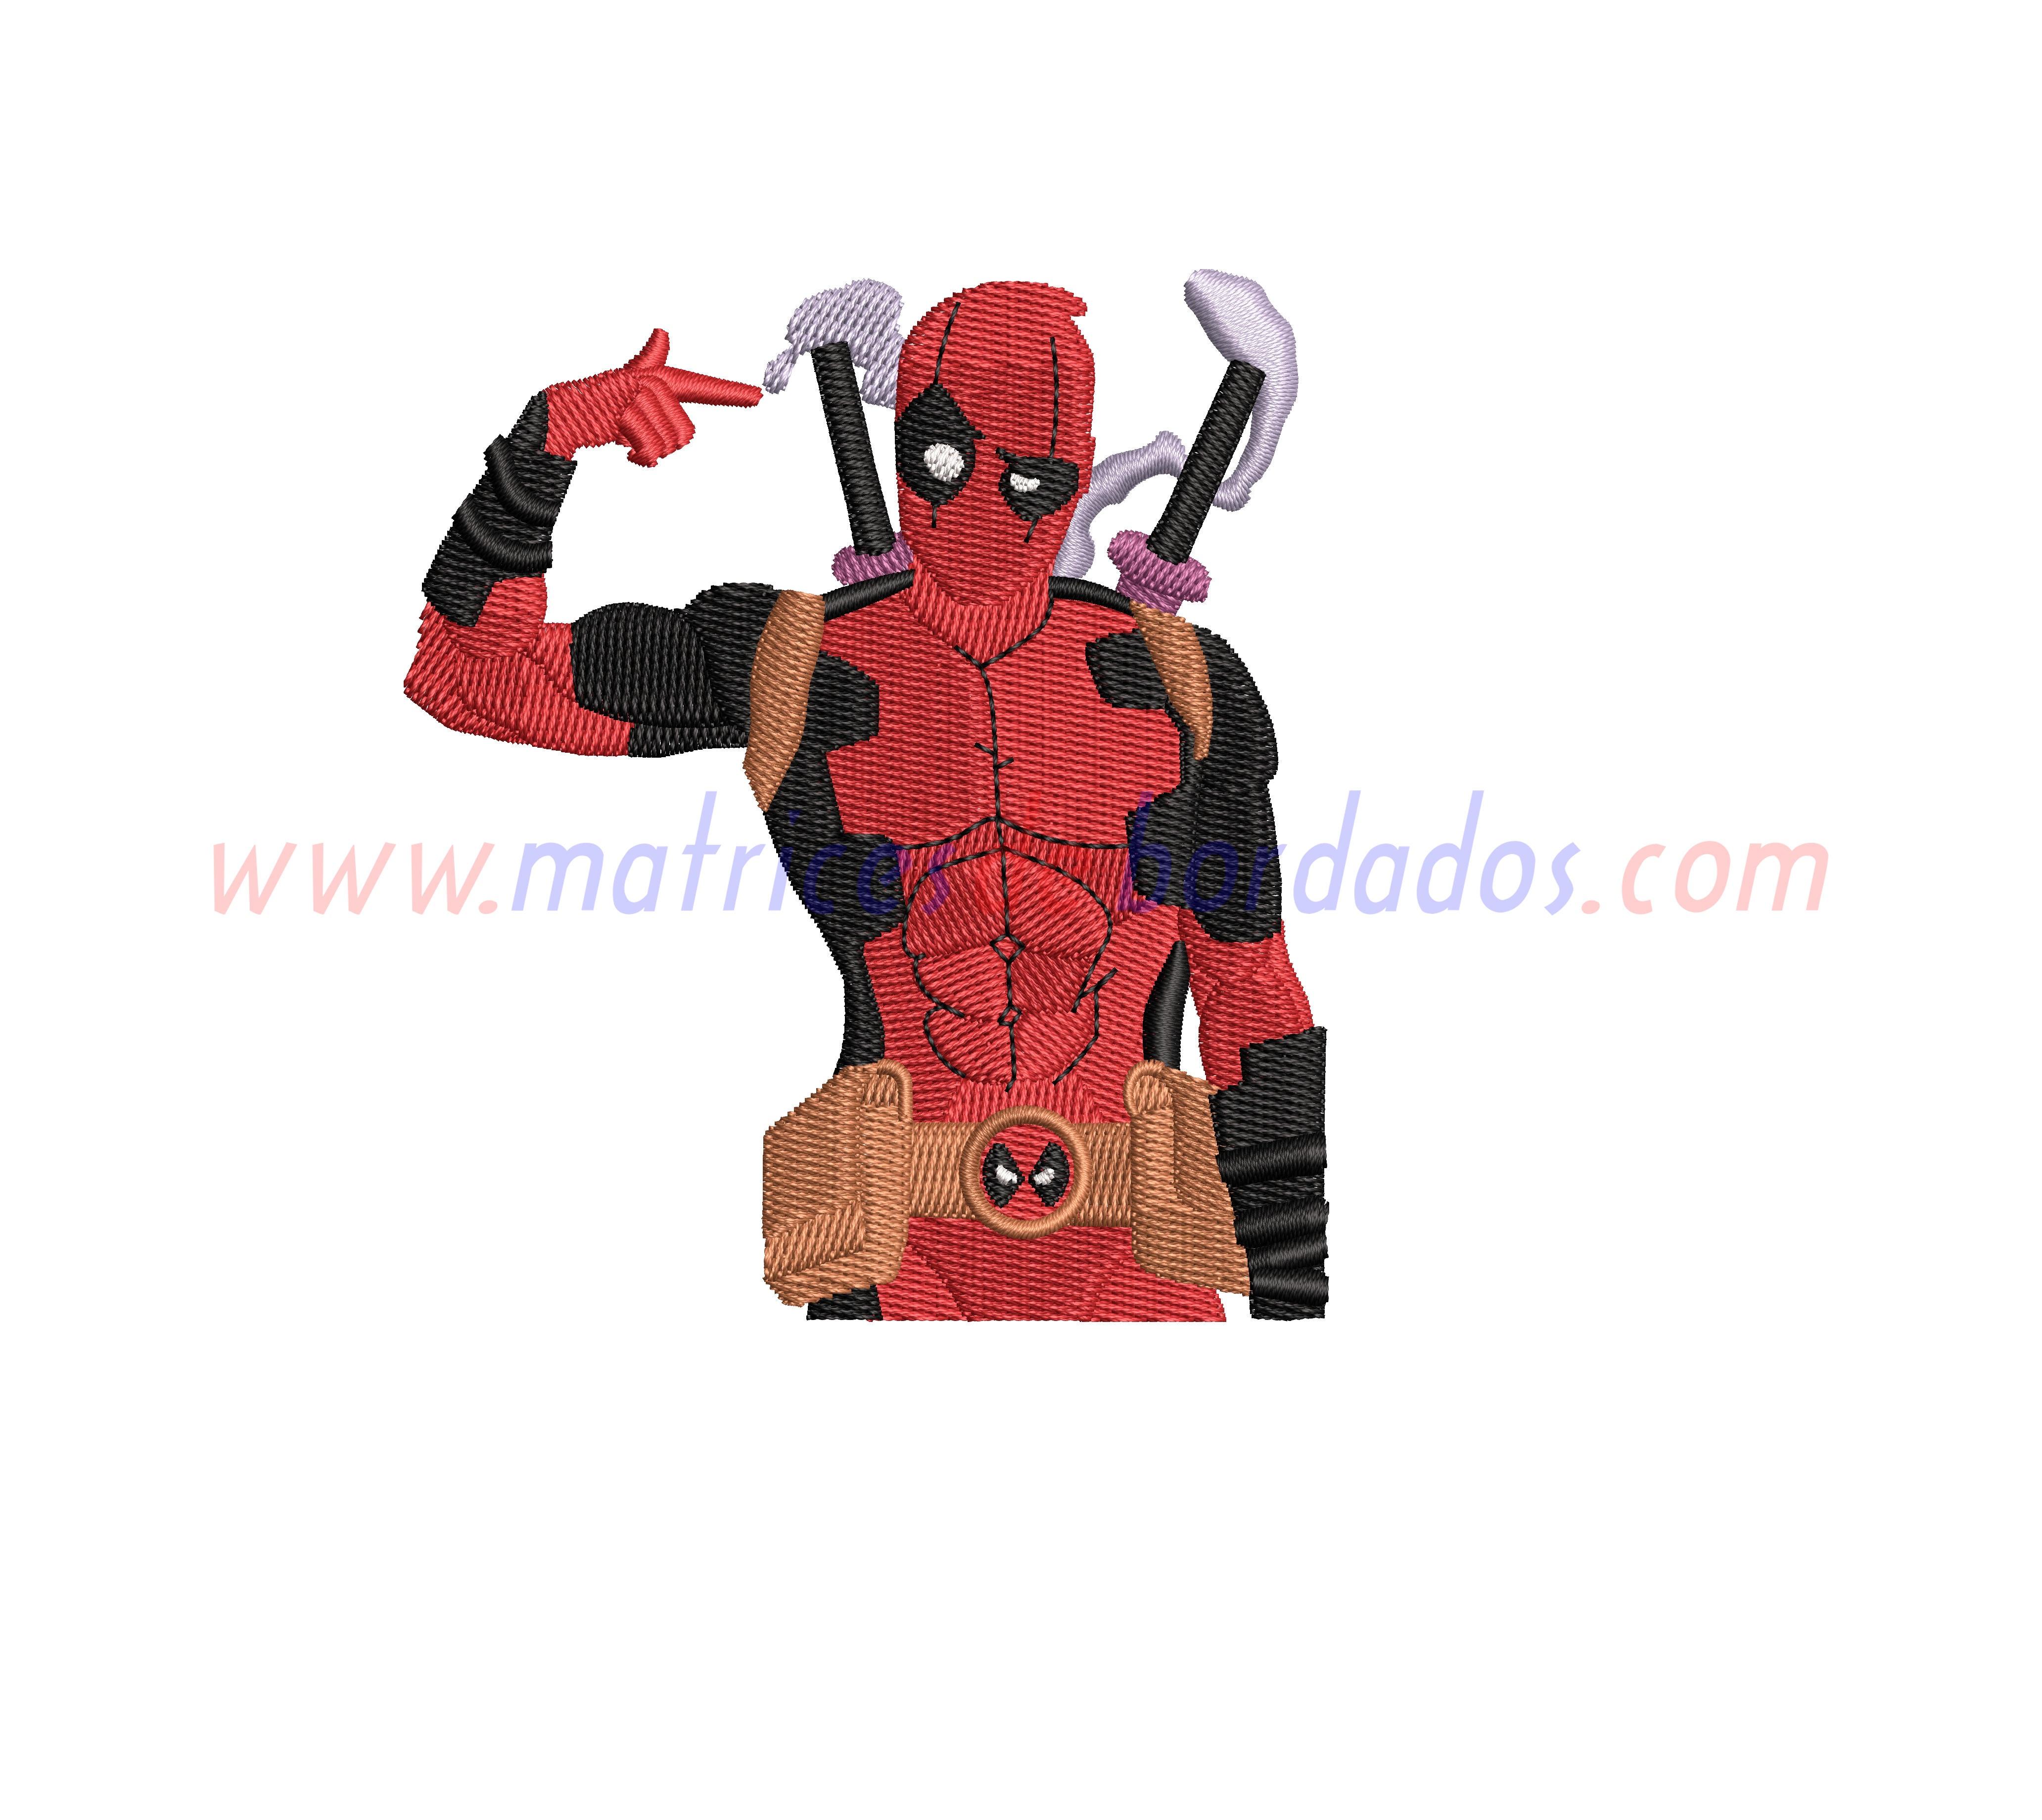 UL69ZR - Deadpool